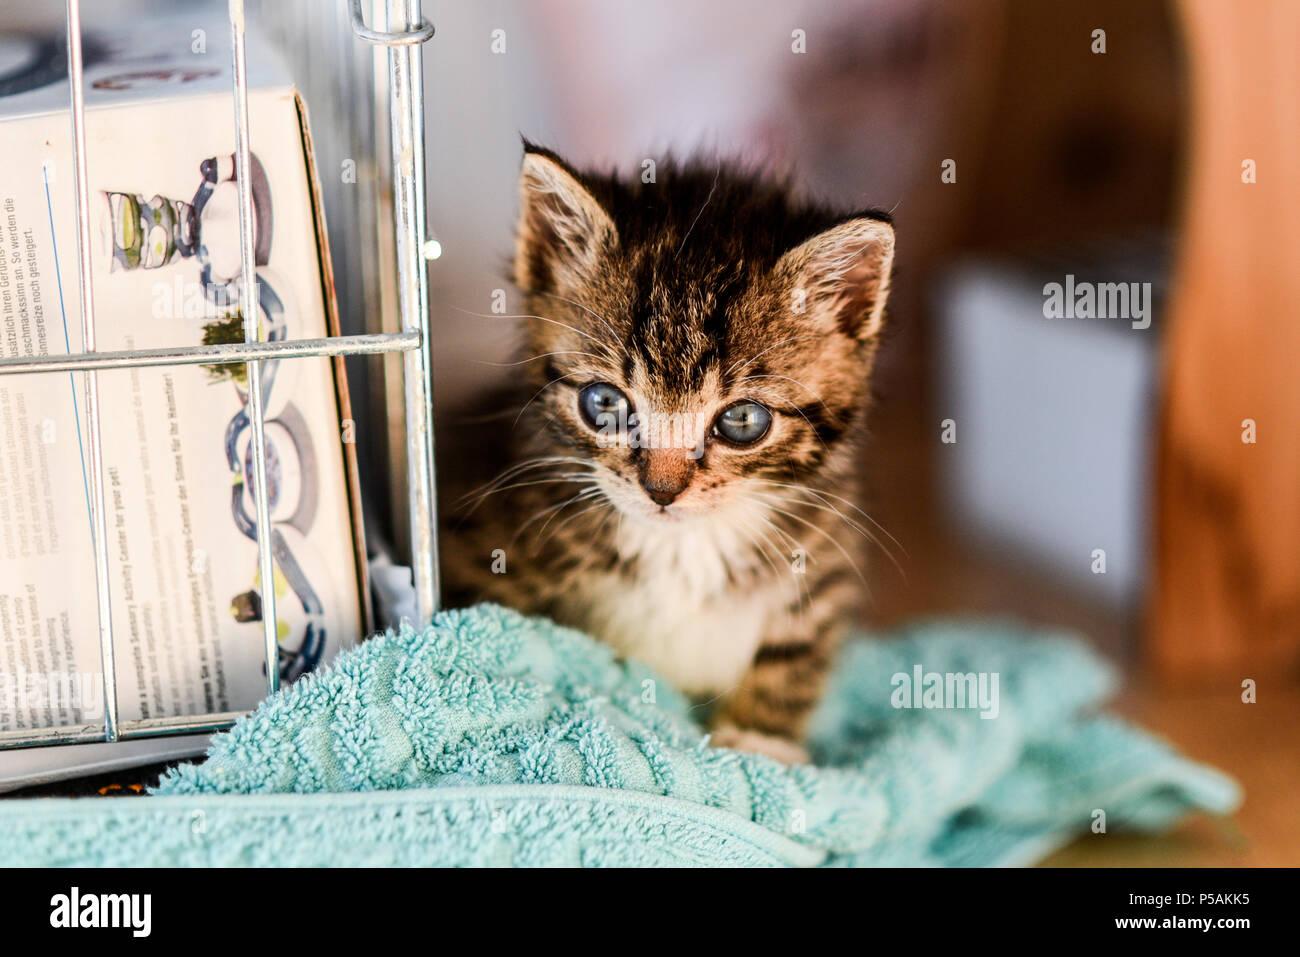 Small sweet tabby kitten.Small sweet tabby kitten. - Stock Image